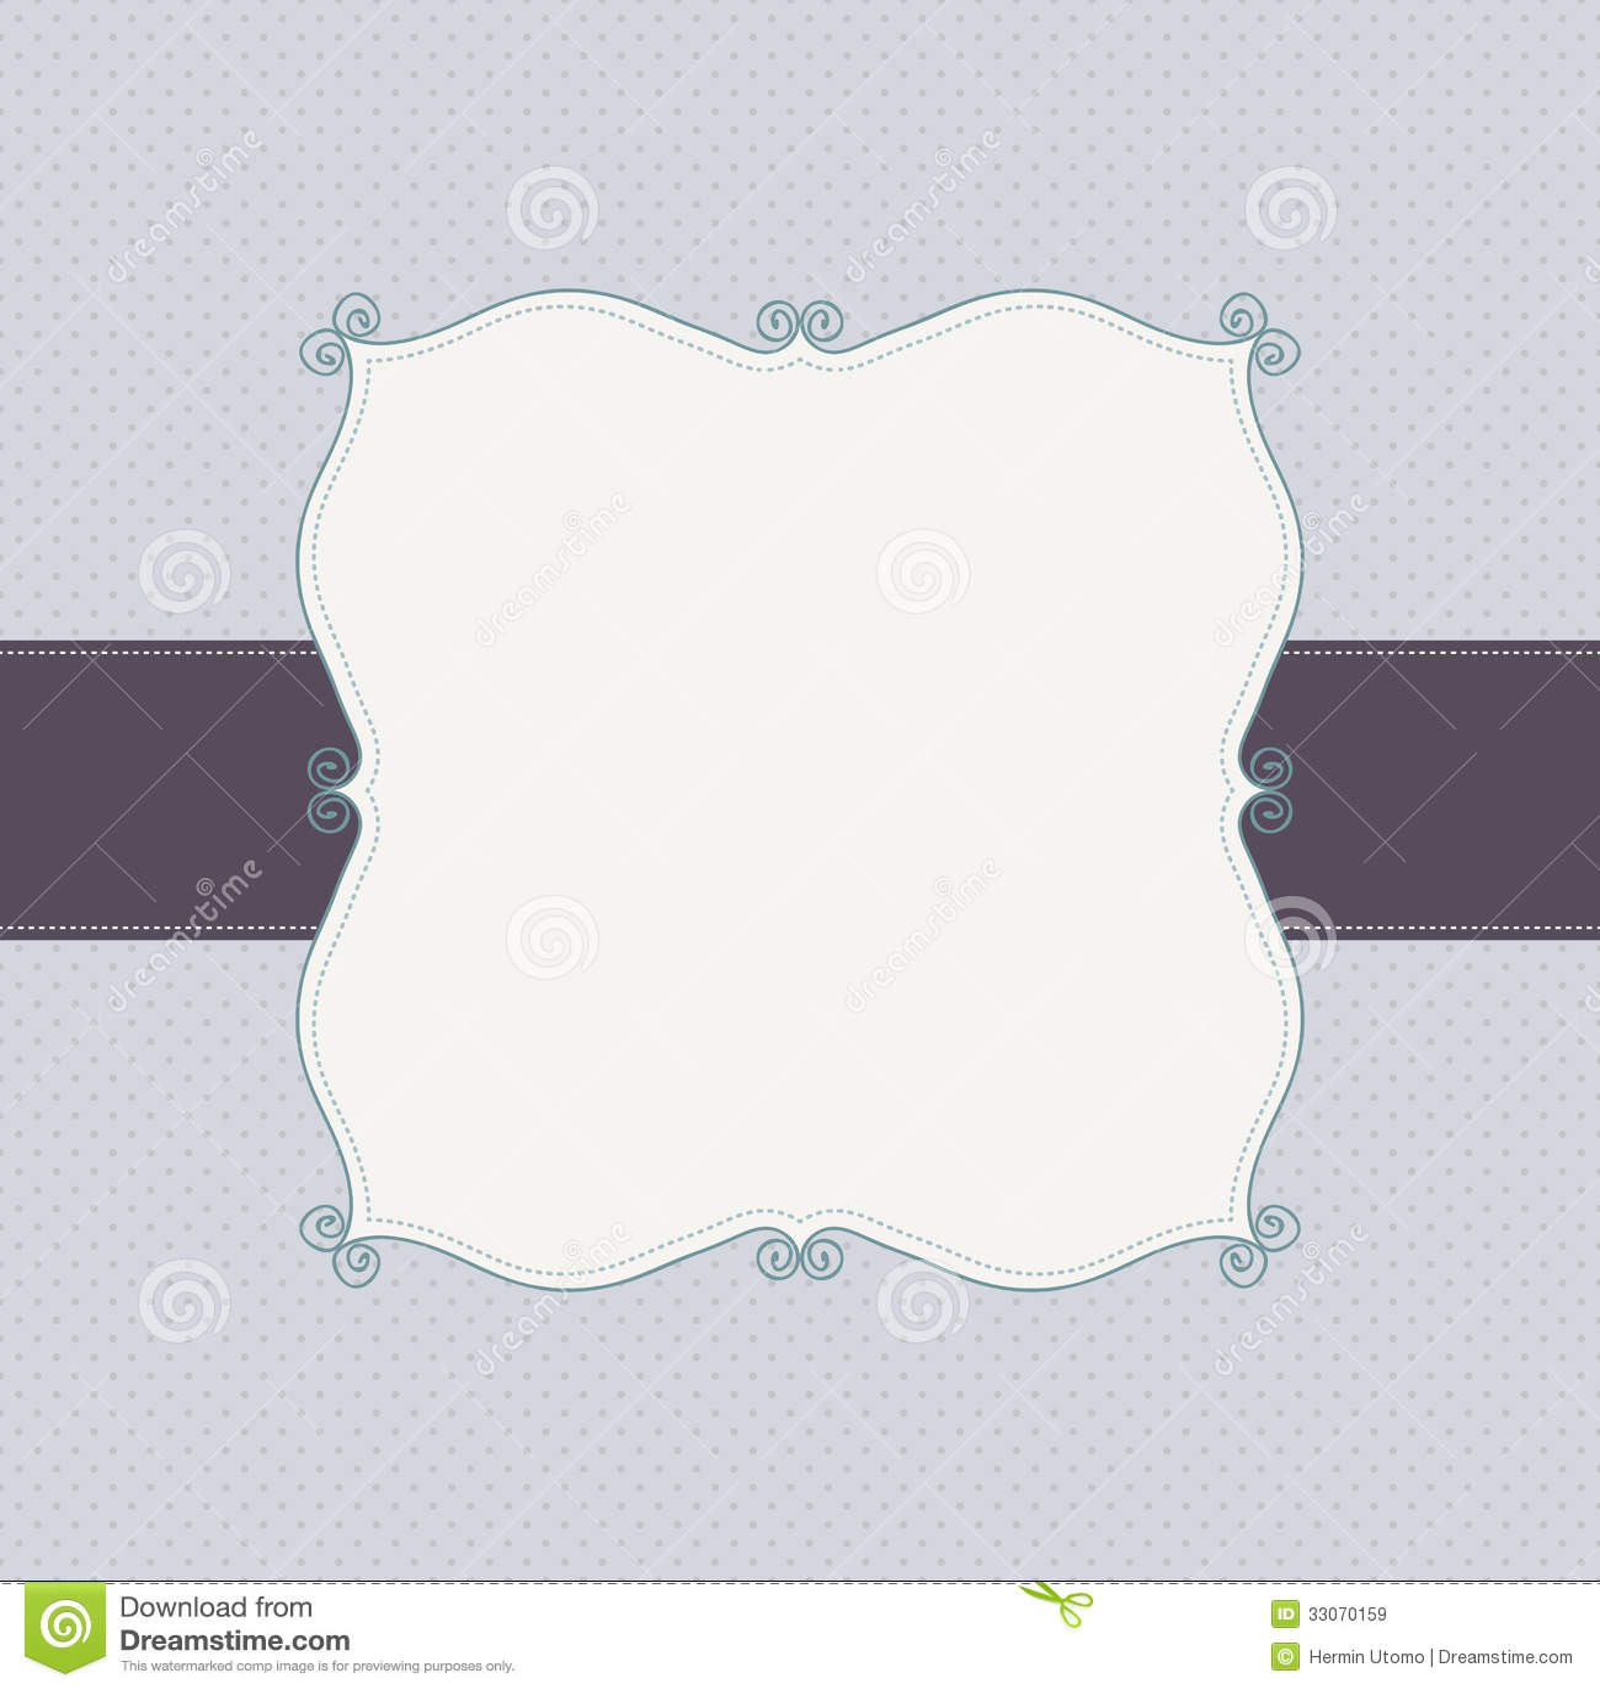 Invitation Card Borders as nice invitations design